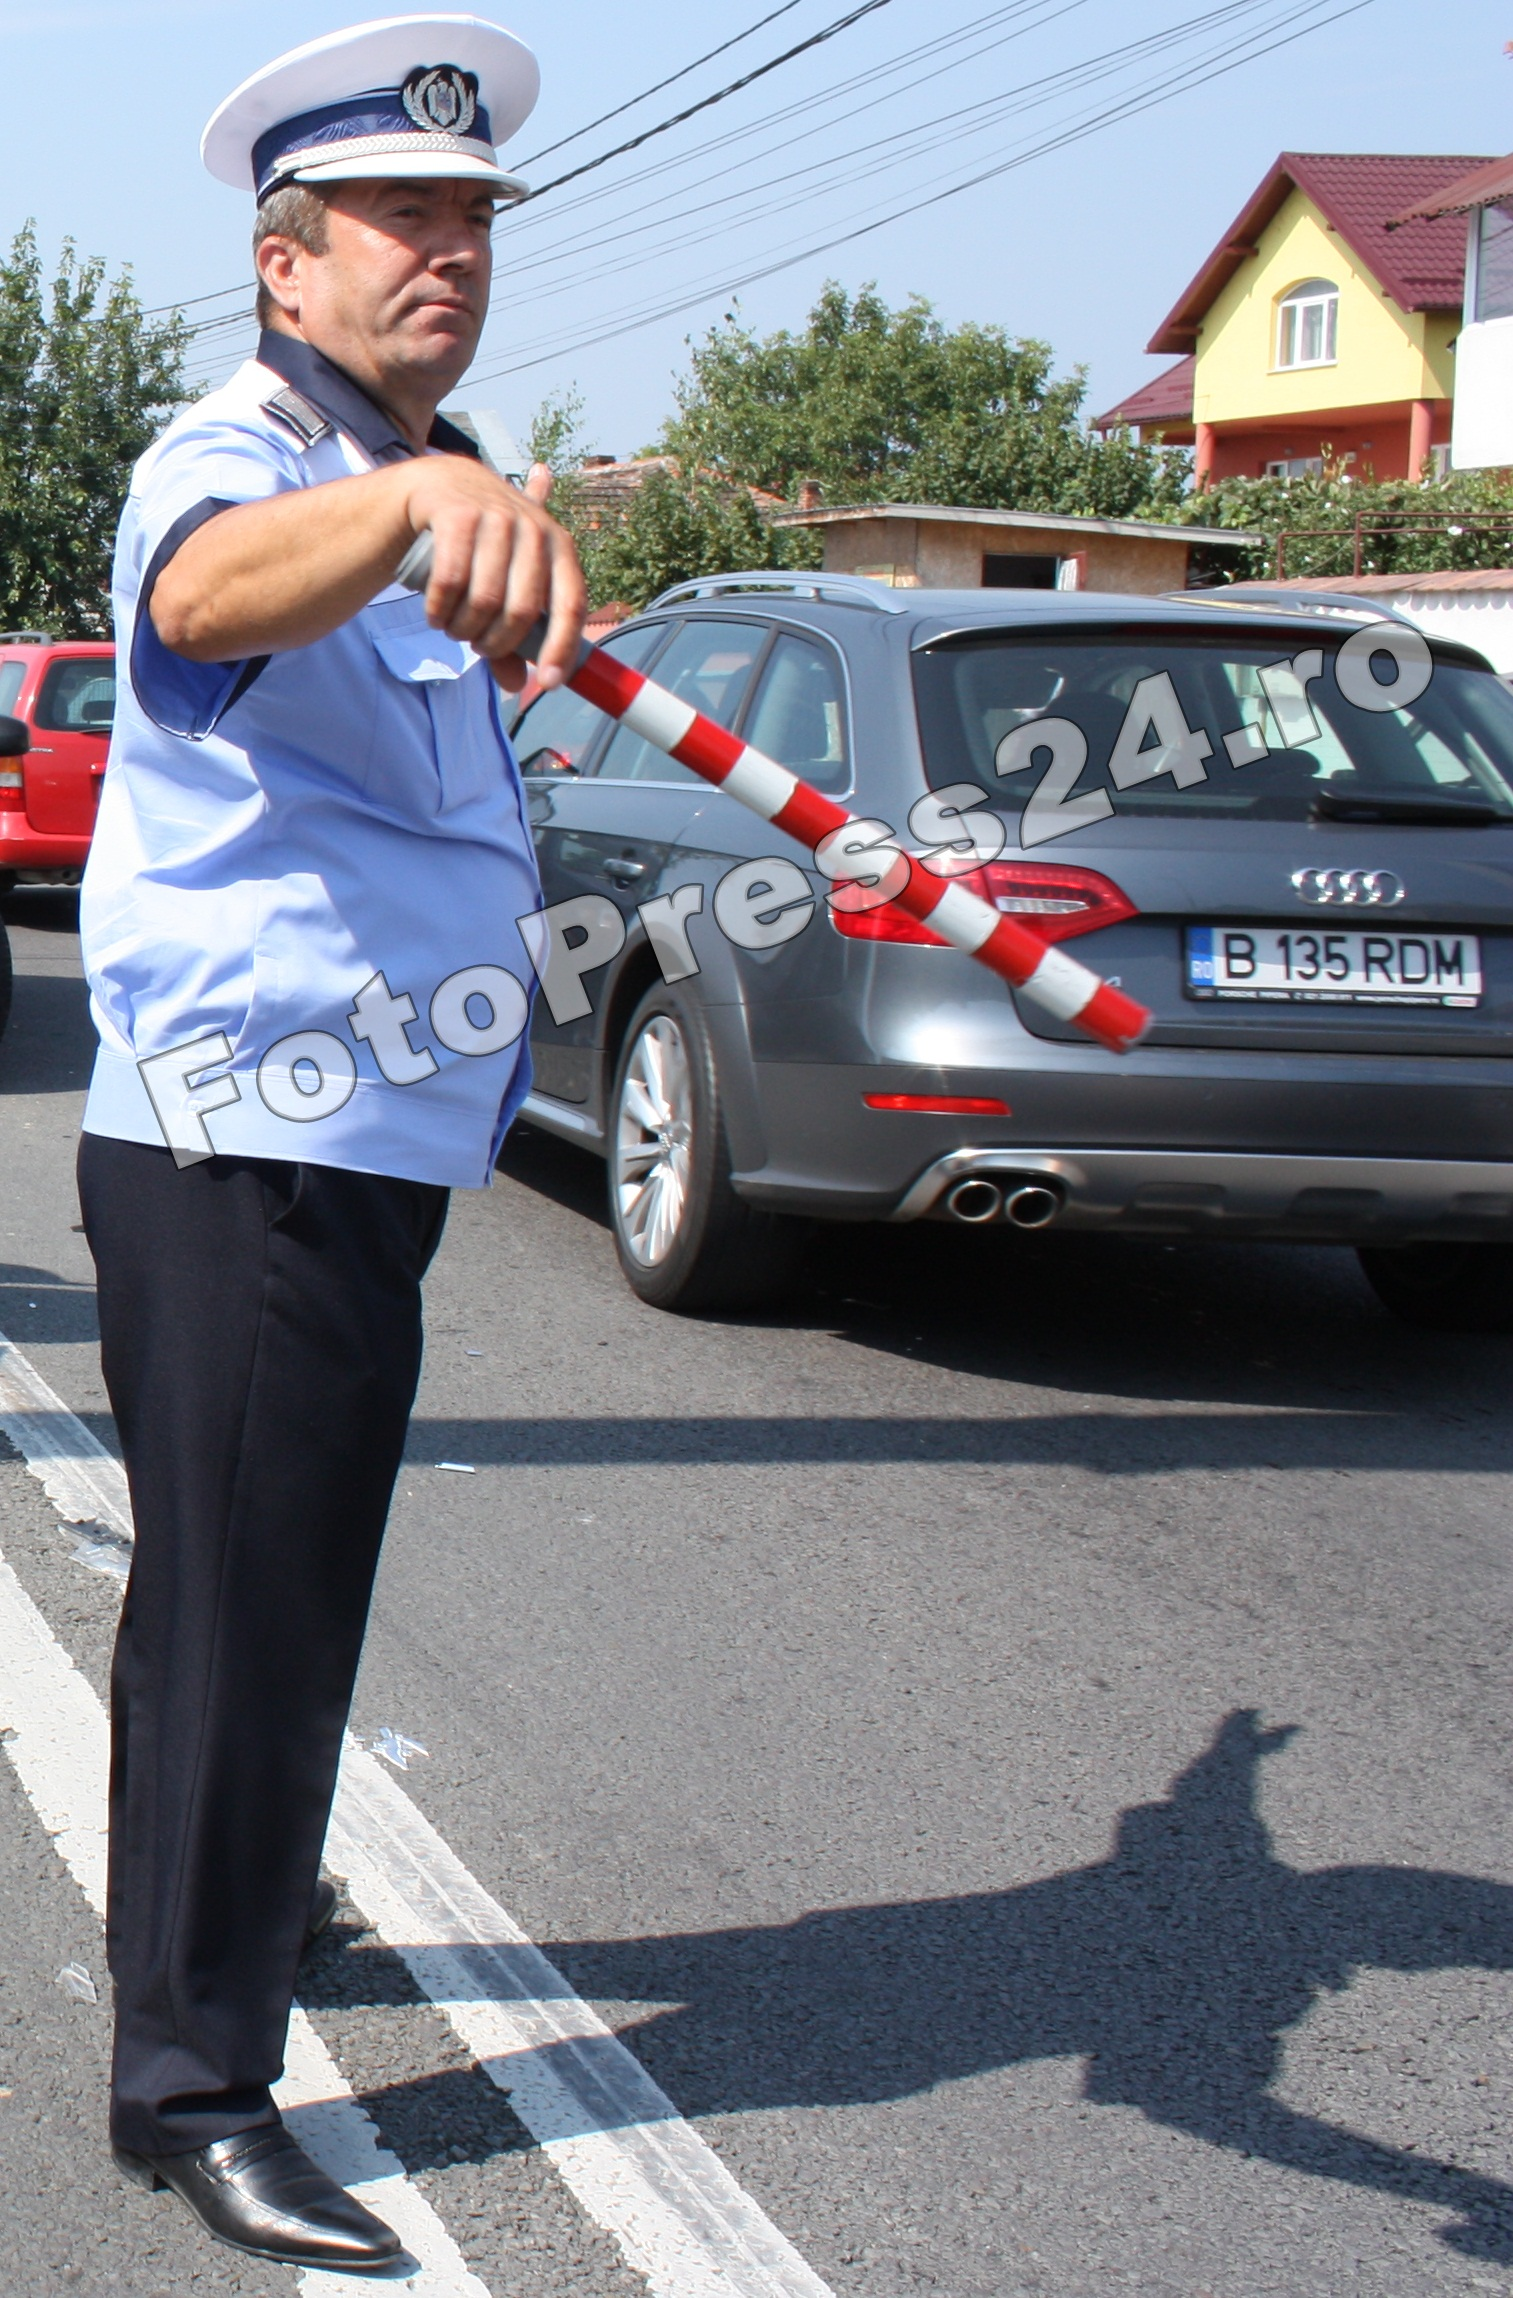 politia rutiera arges-fotopress24.ro-Mihai Neacsu (1)